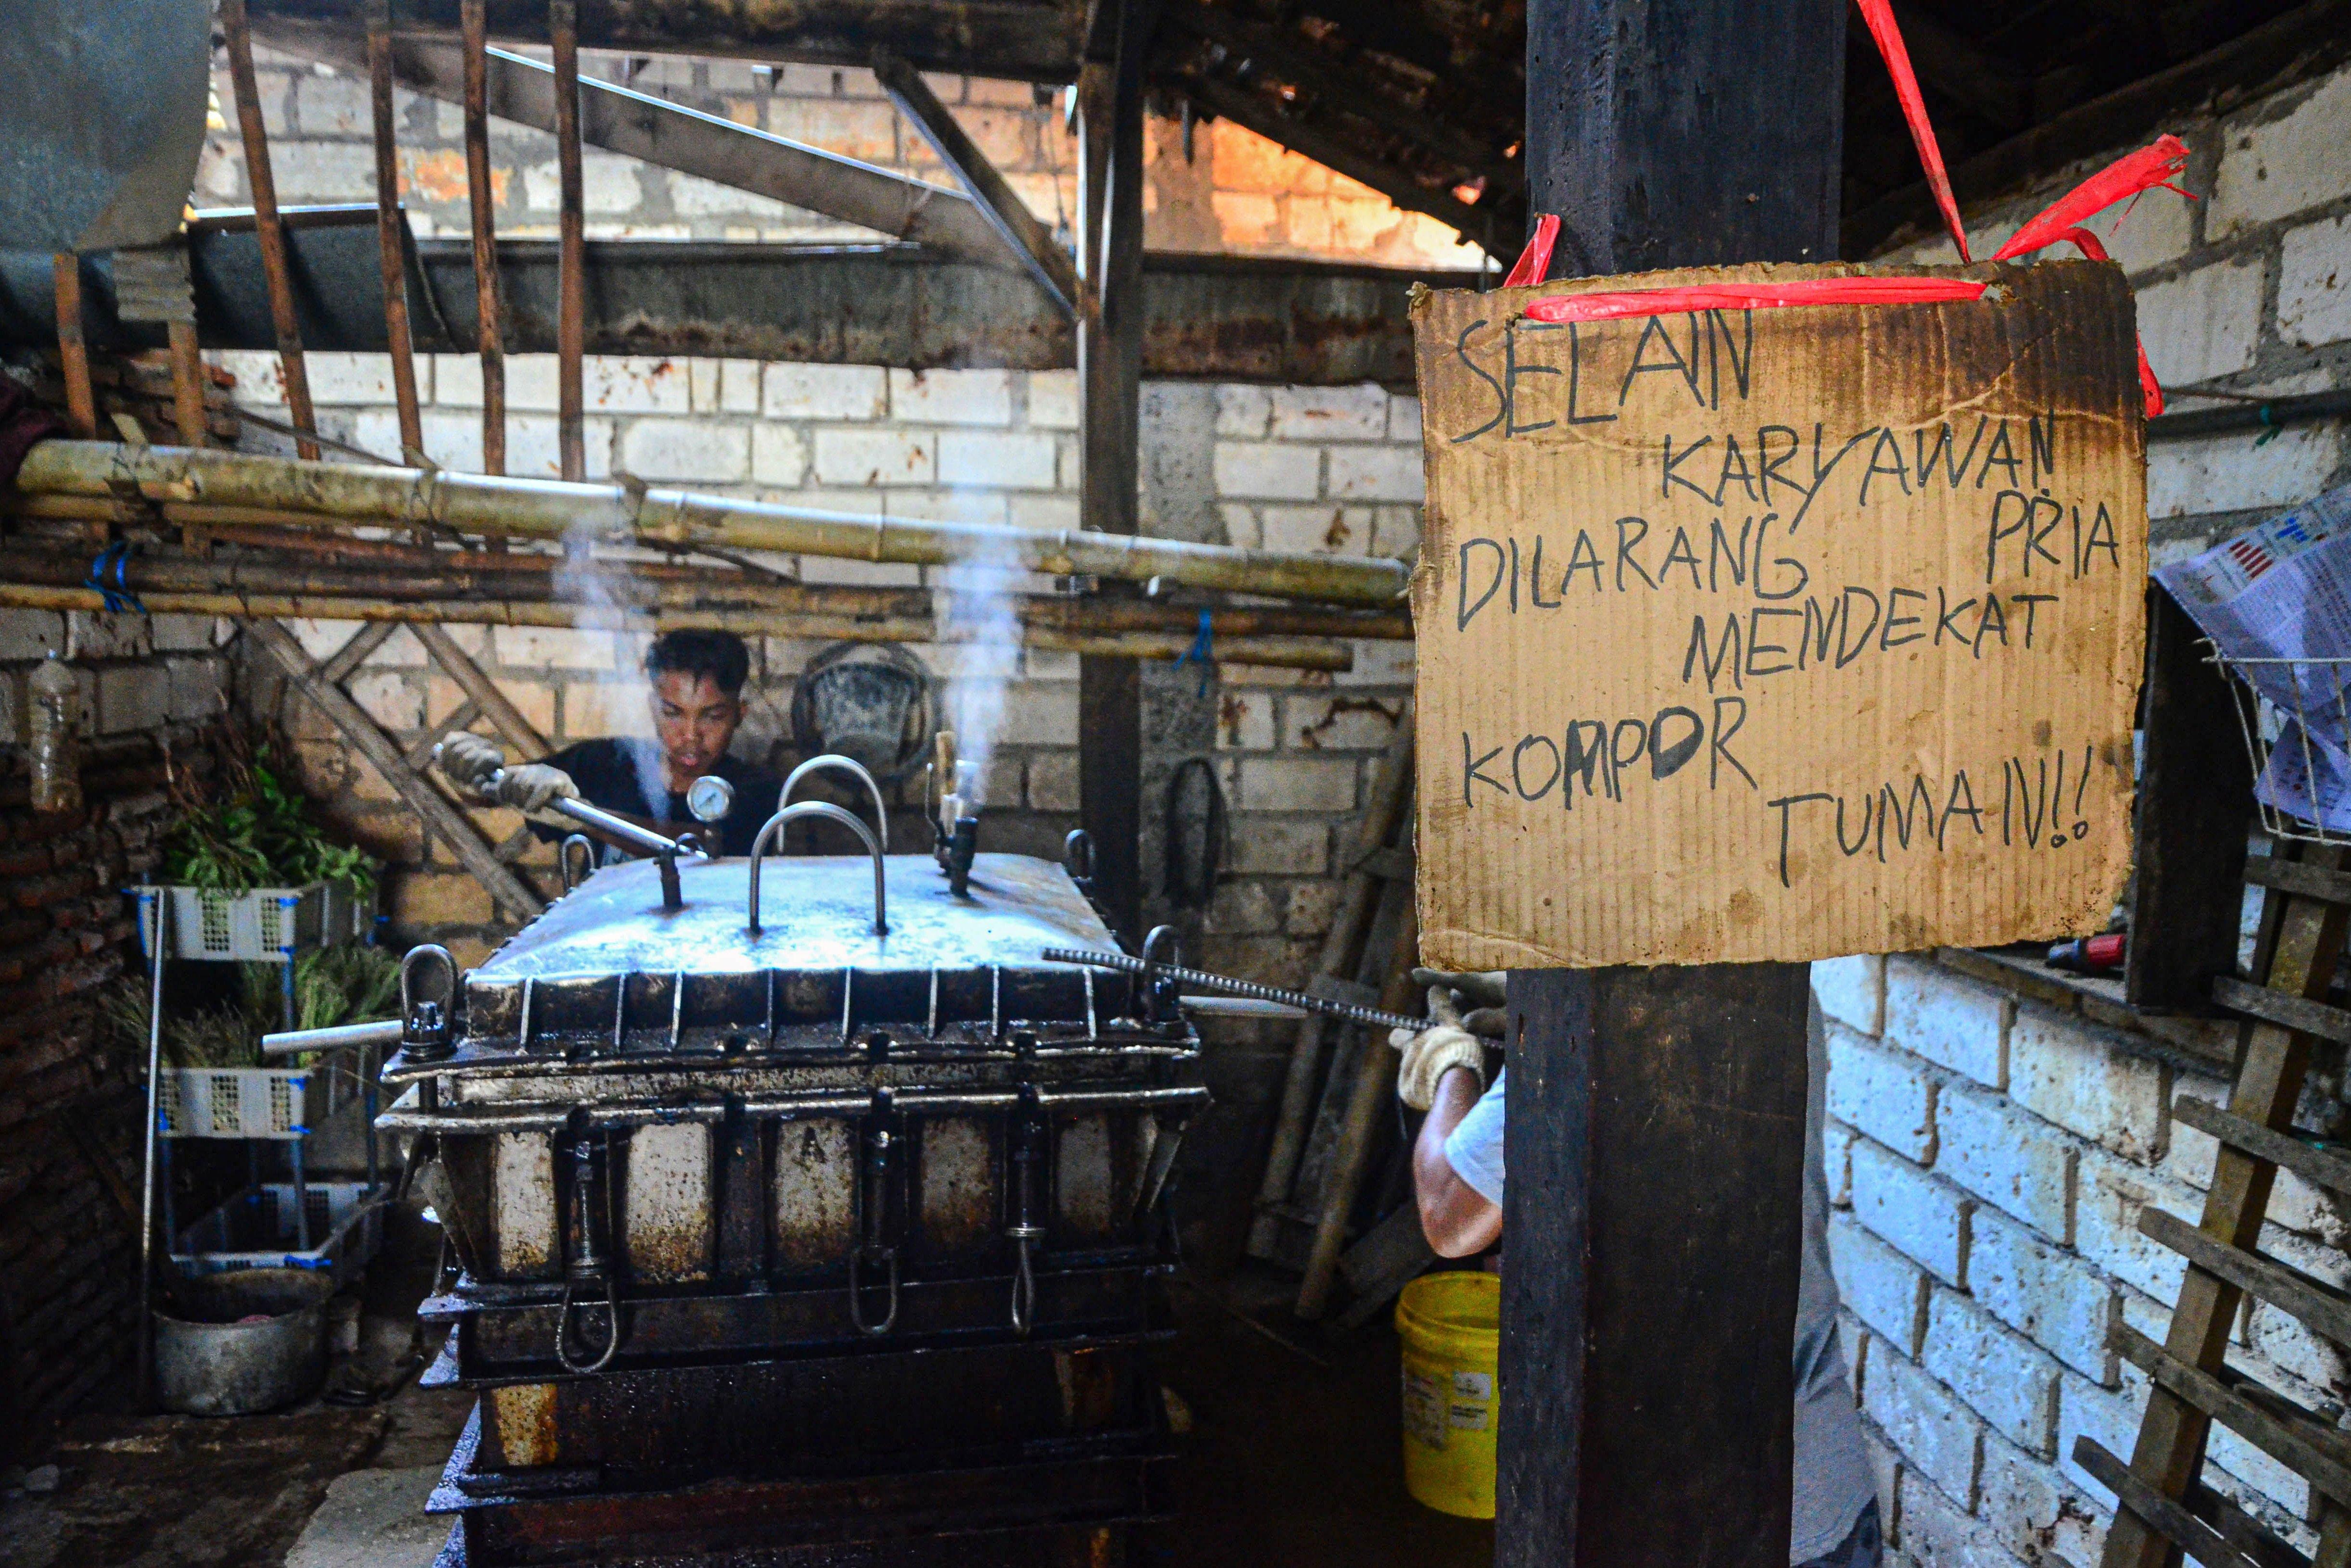 Pekerja membuka kunci pada tutup panci presto di Desa Dukutalit, Juwana, Pati, Jawa Tengah.